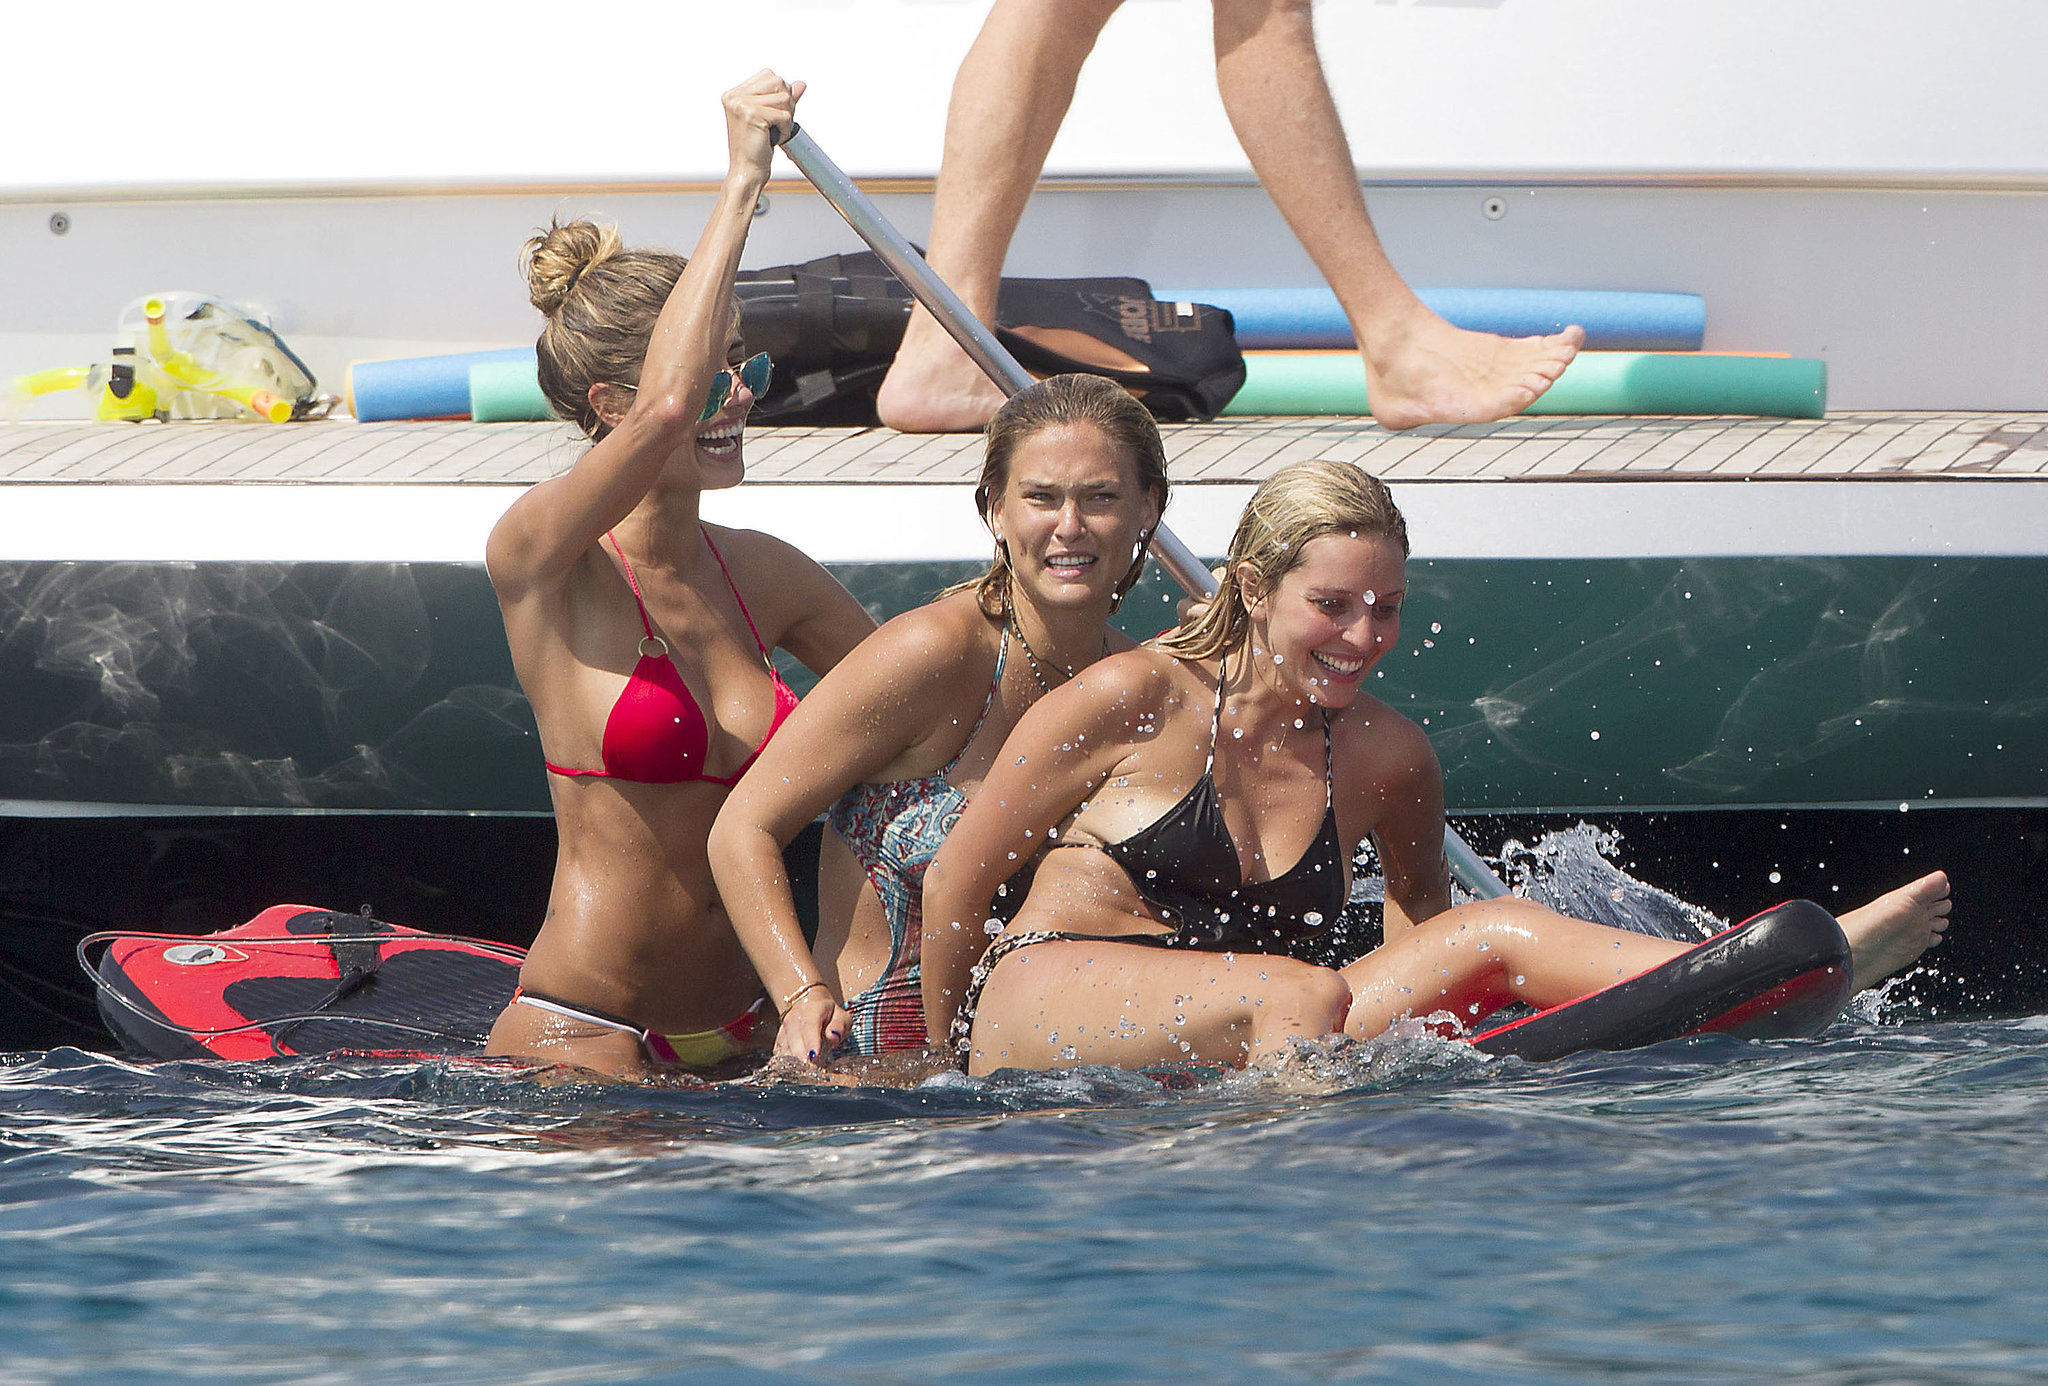 Bar Refaeli went paddleboarding in the ocean.